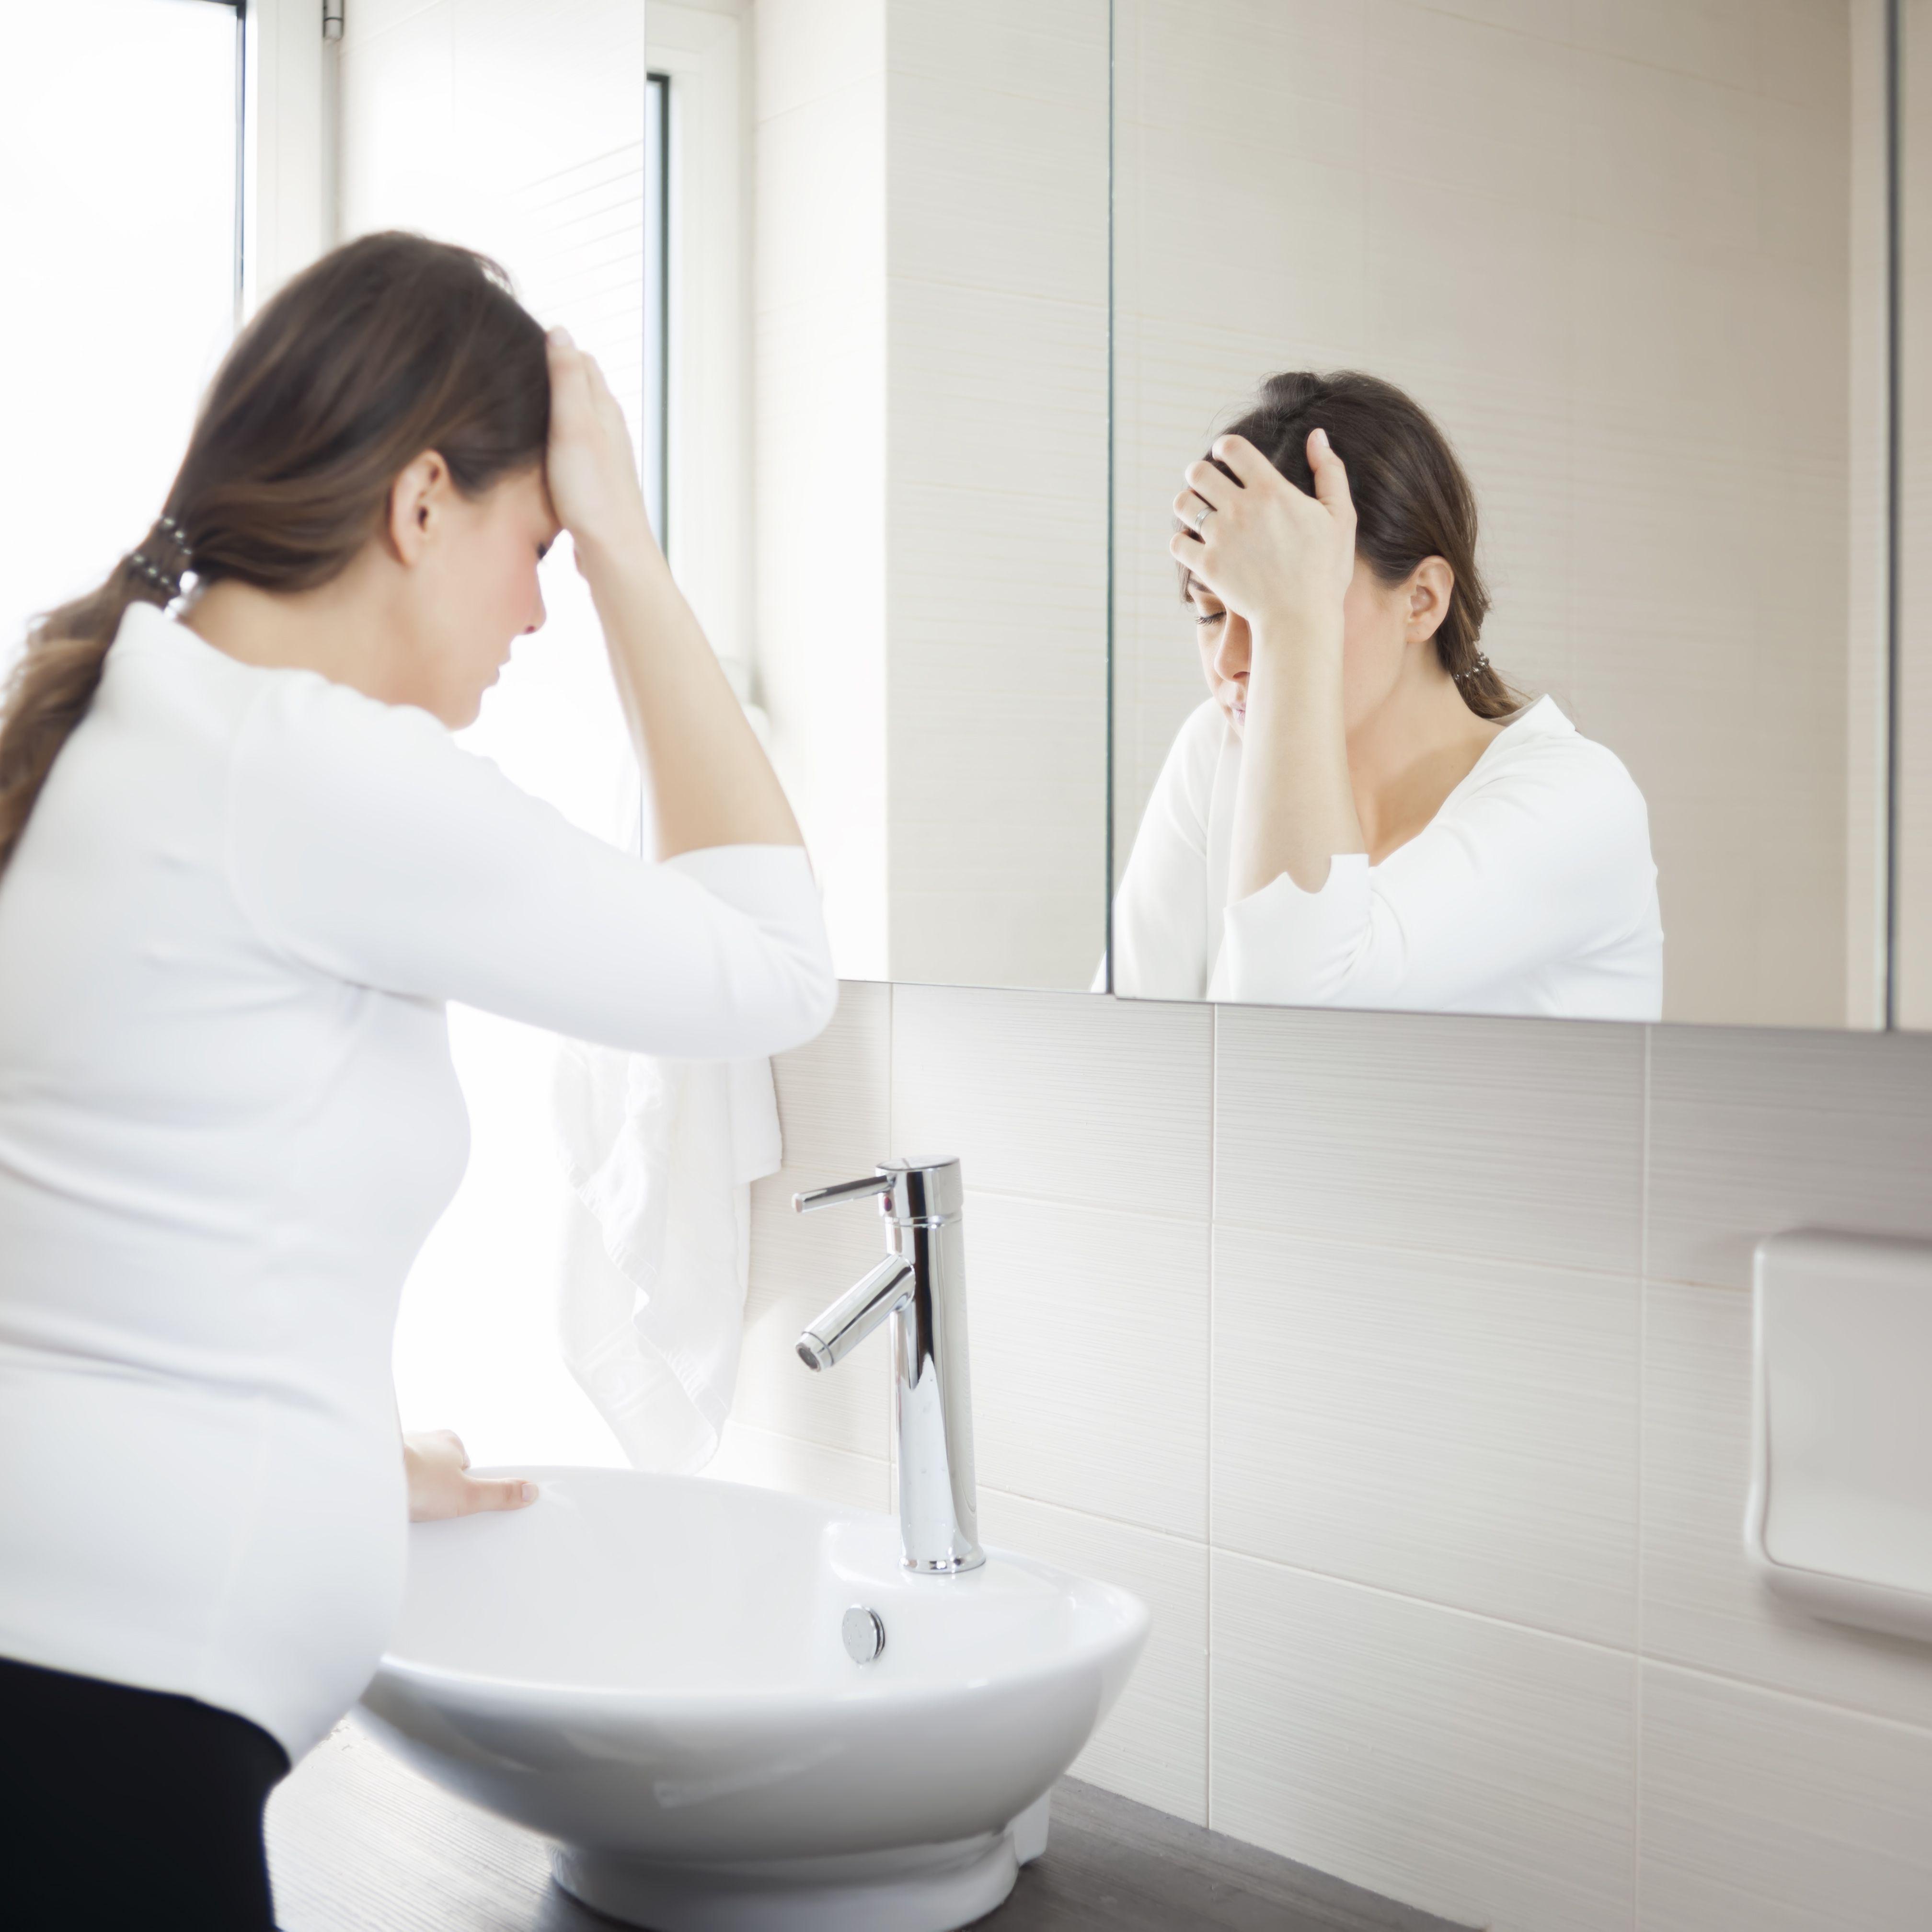 Morning Sickness as a Pregnancy Symptom